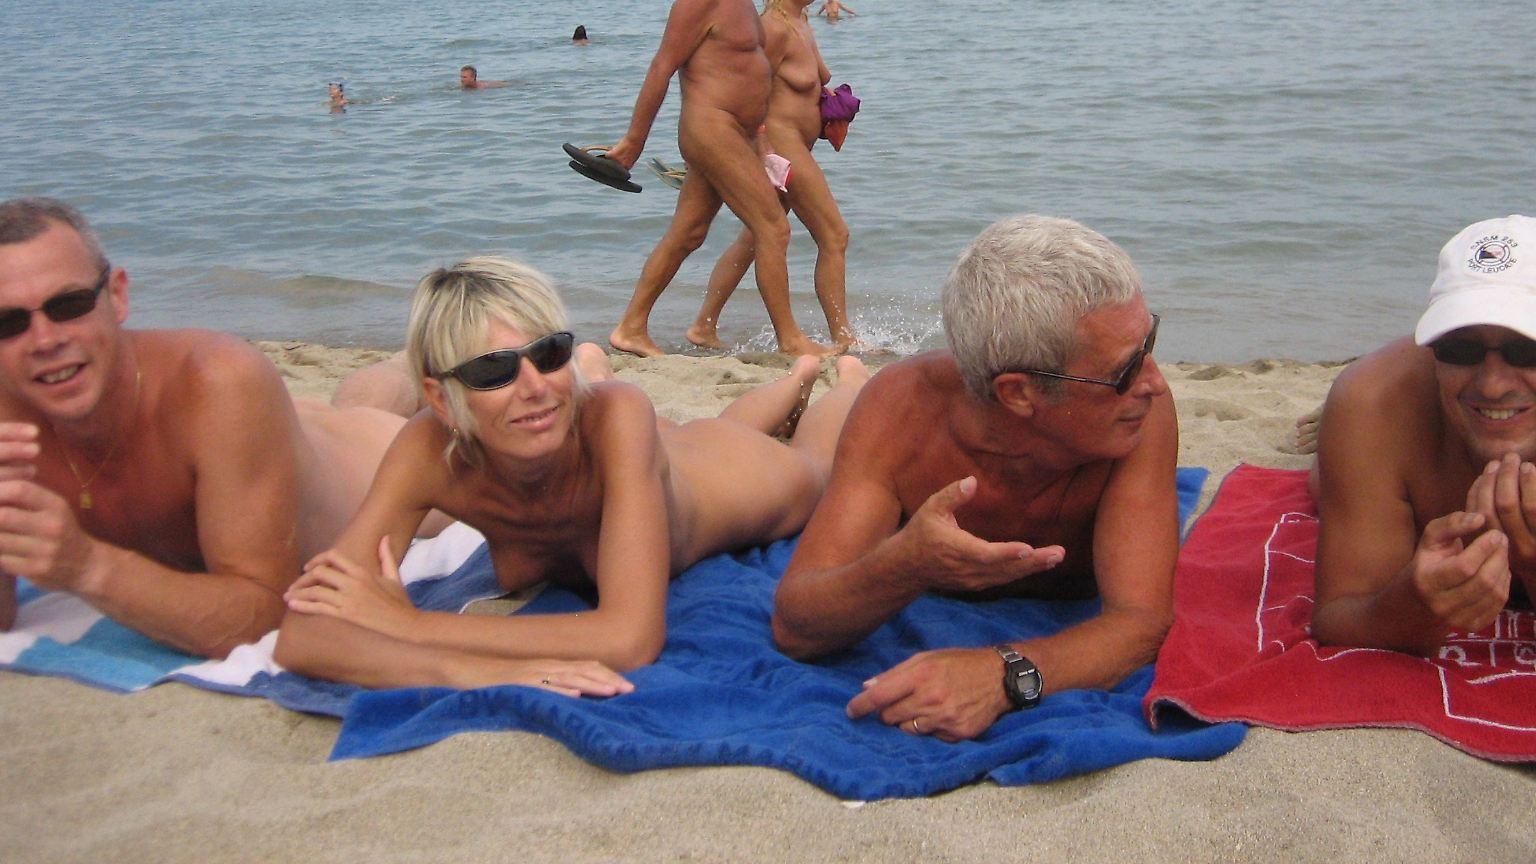 verbotene nudisten strand